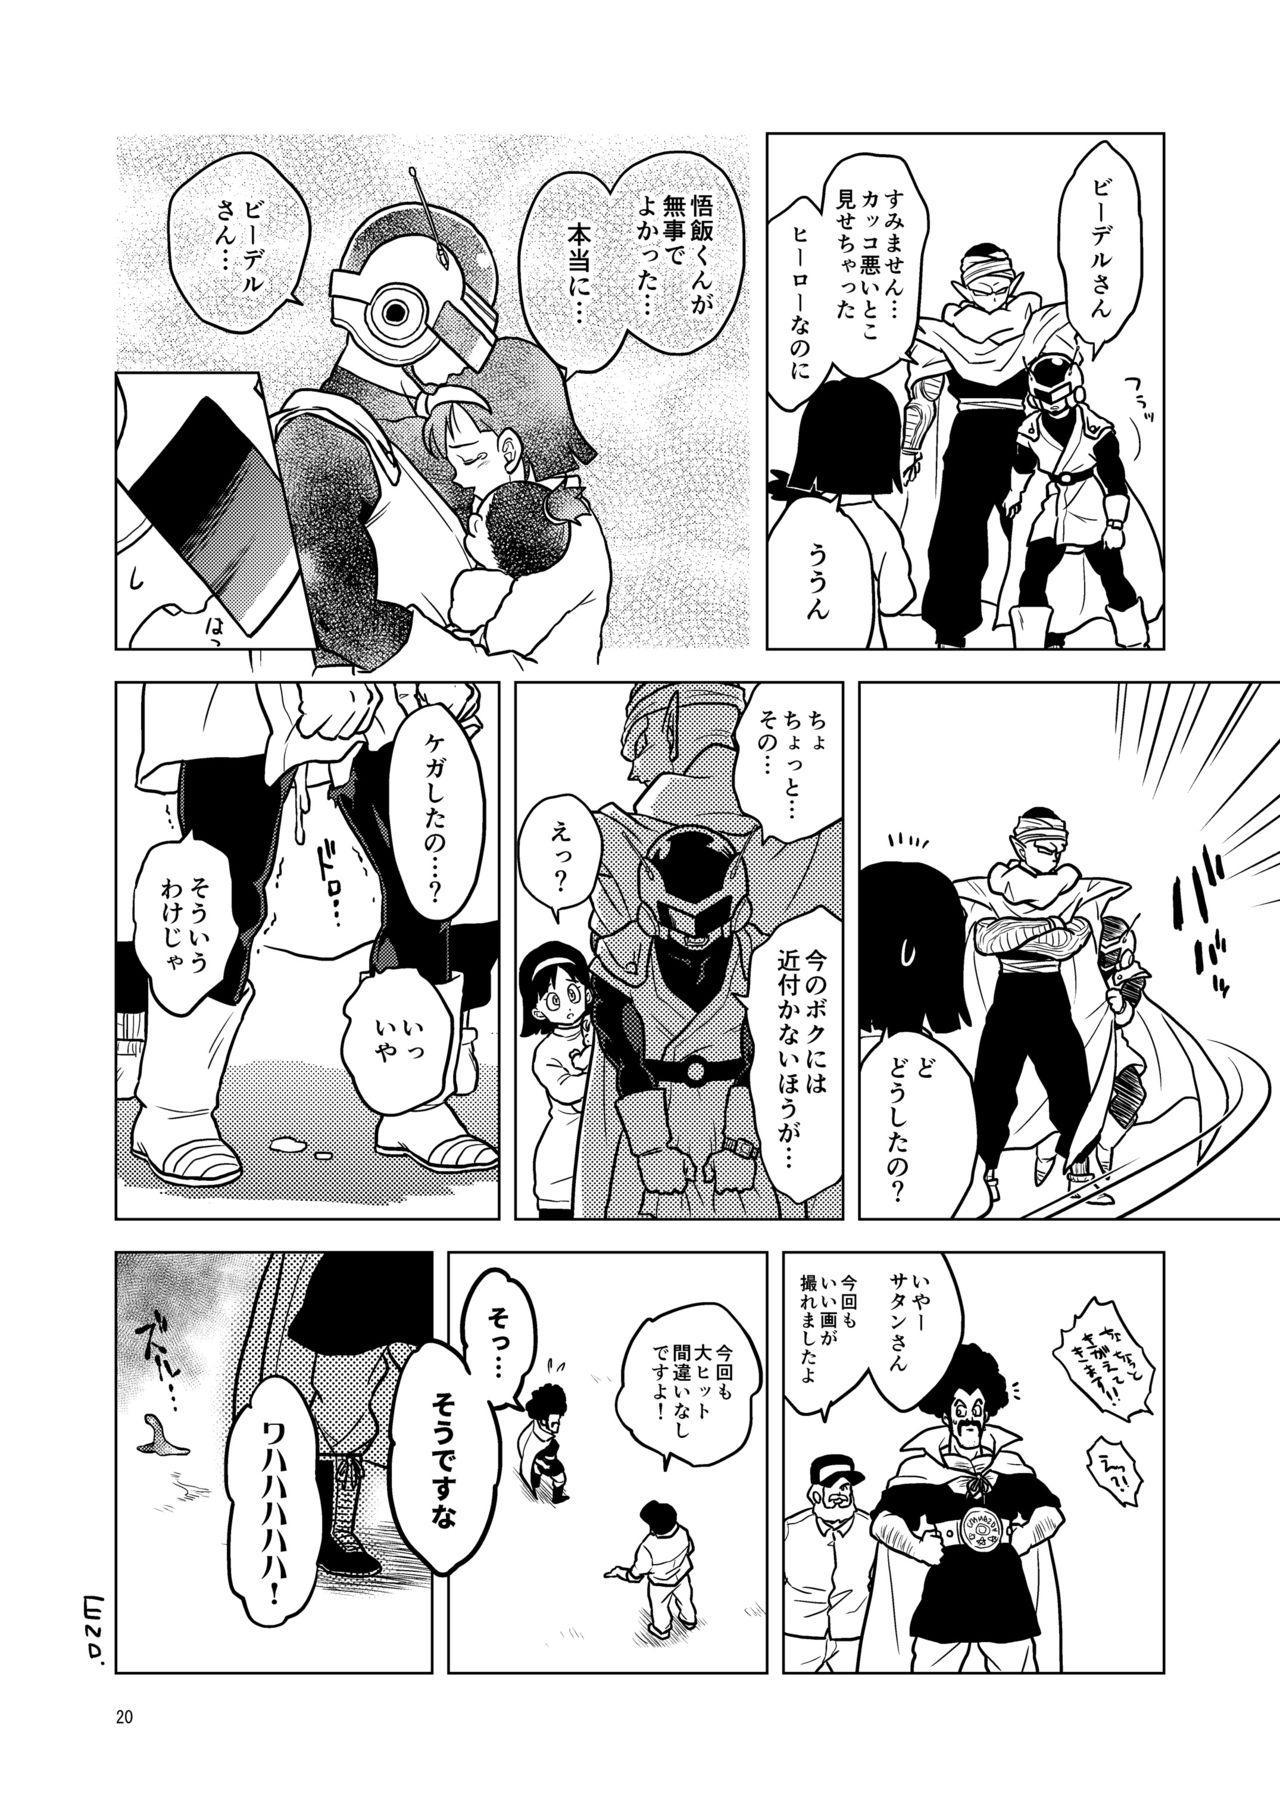 Great Saiyaman vs Shokushu Kaijin 19